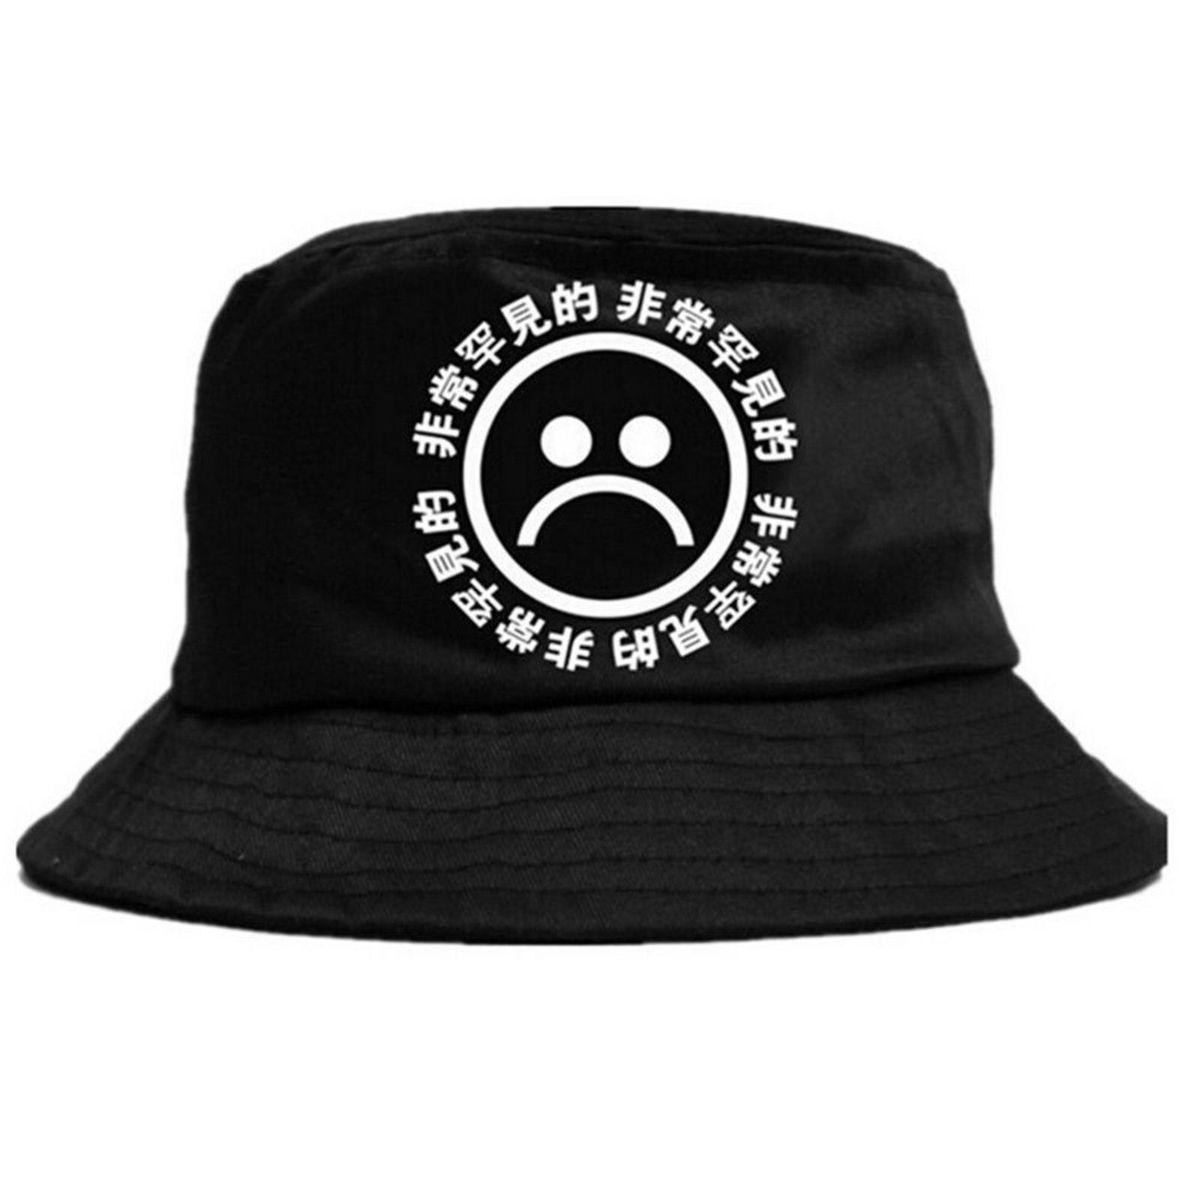 Bucket Hat Sad Boy Chapeu Masculino Sad Boy Nunca Usado 28561842 Enjoei